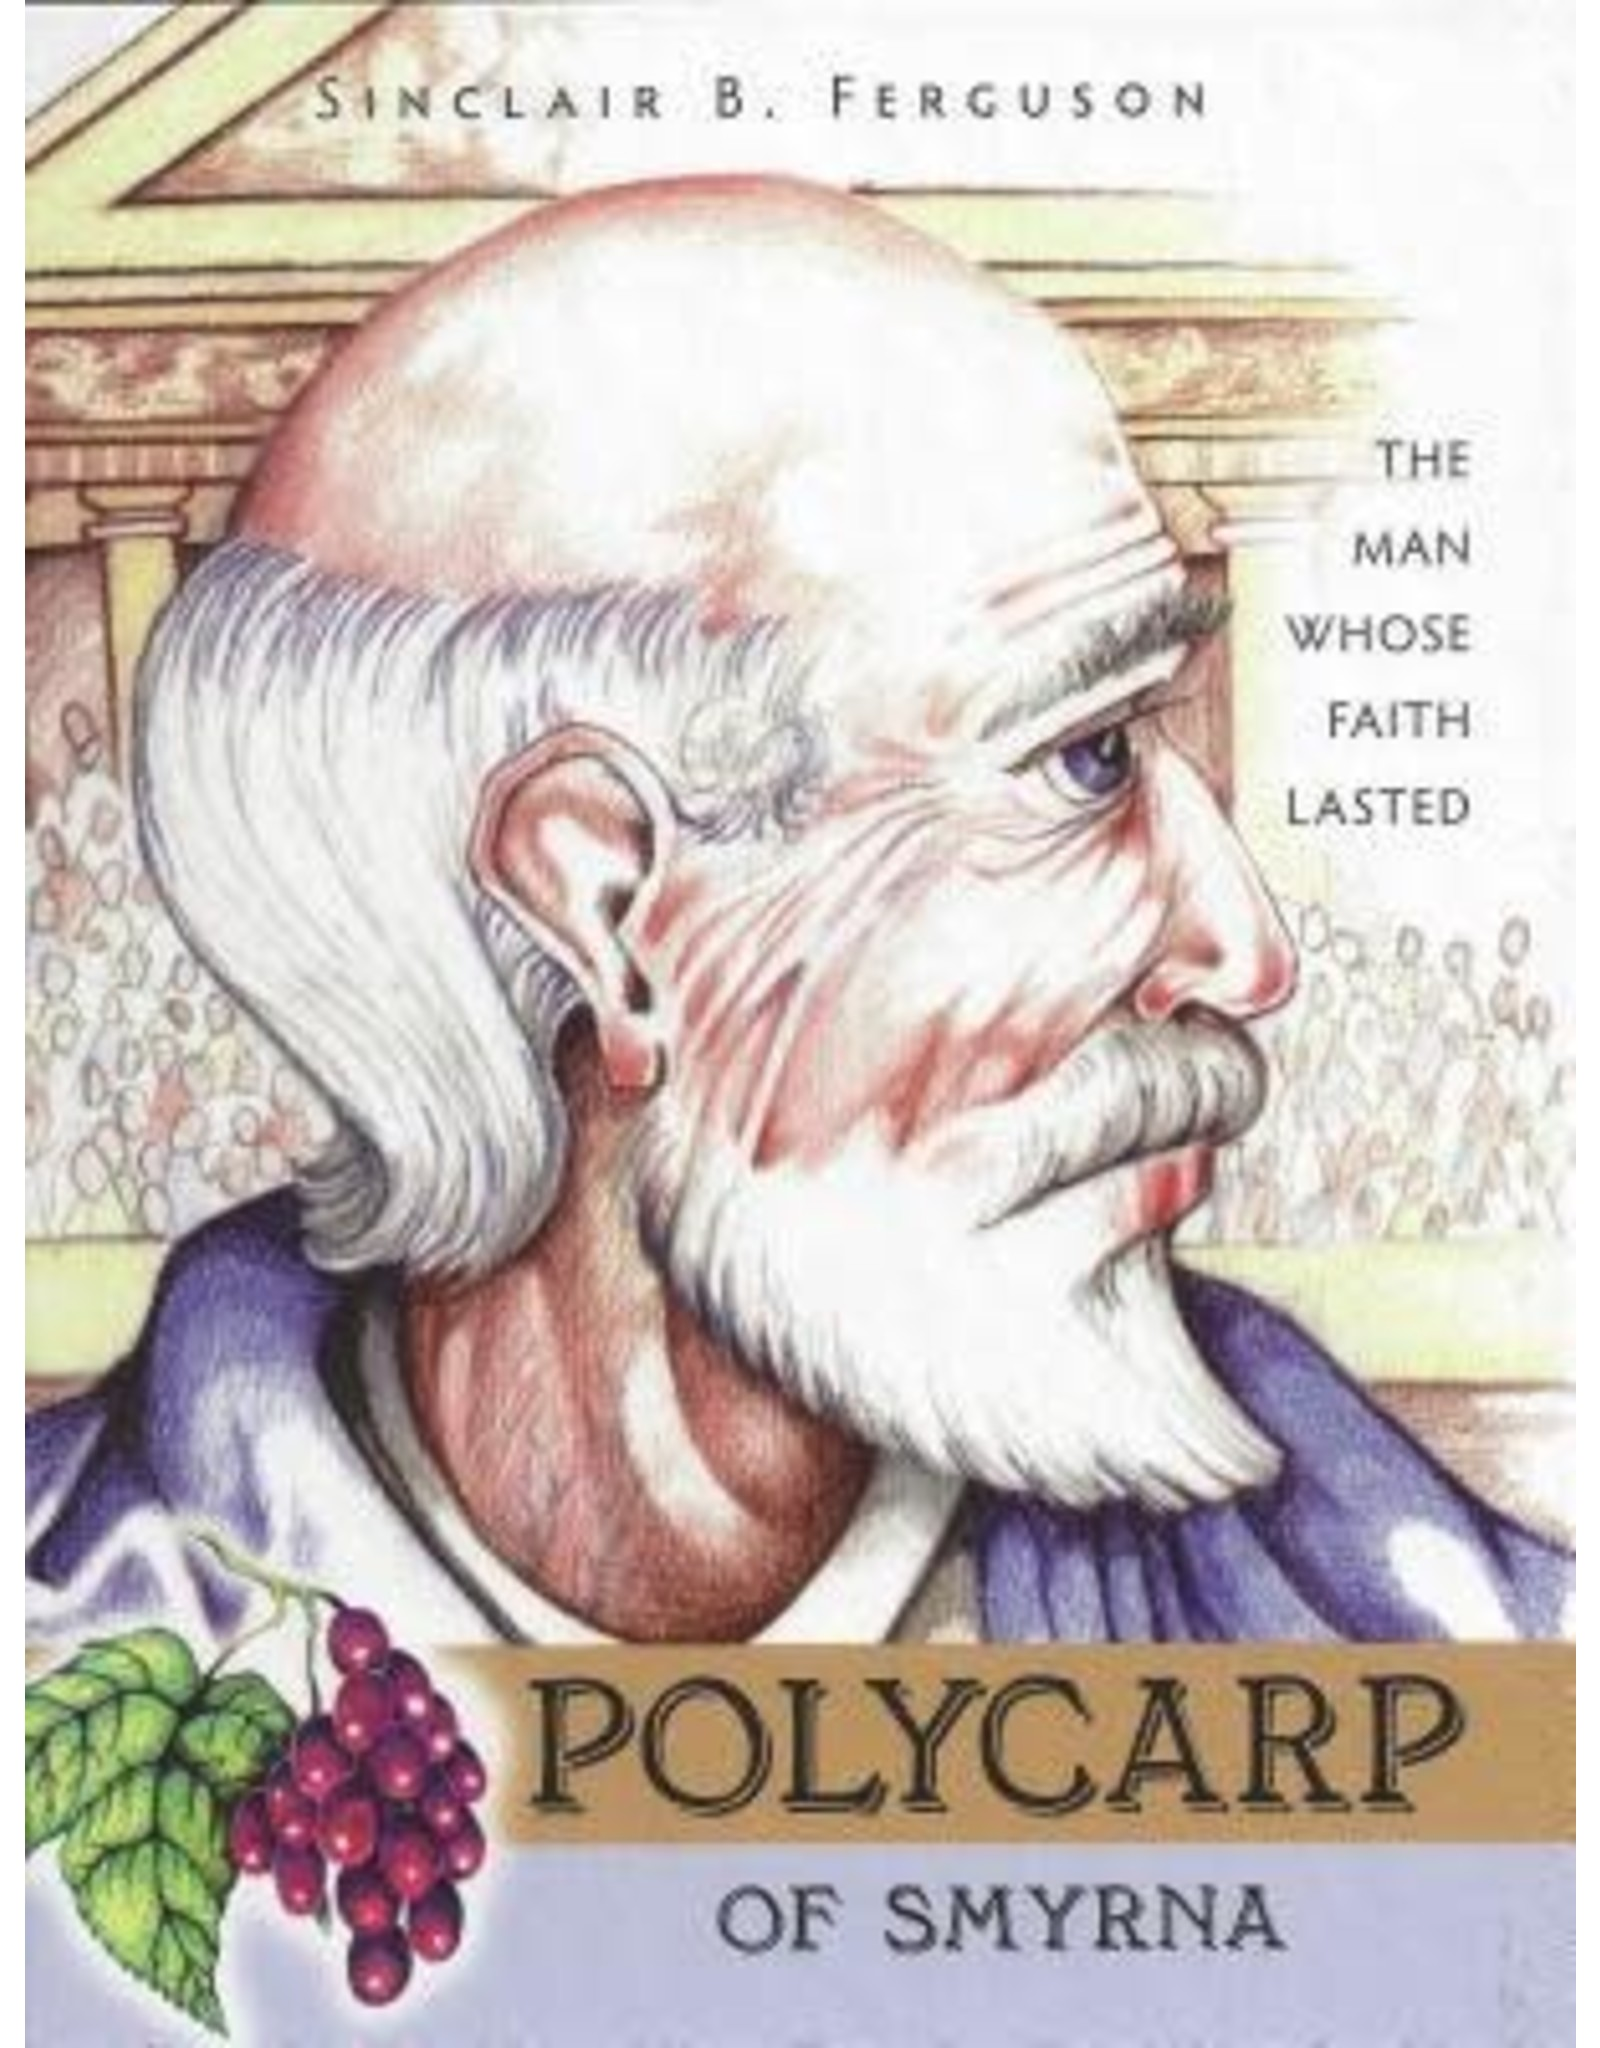 Ferguson Polycarp of Smyrna